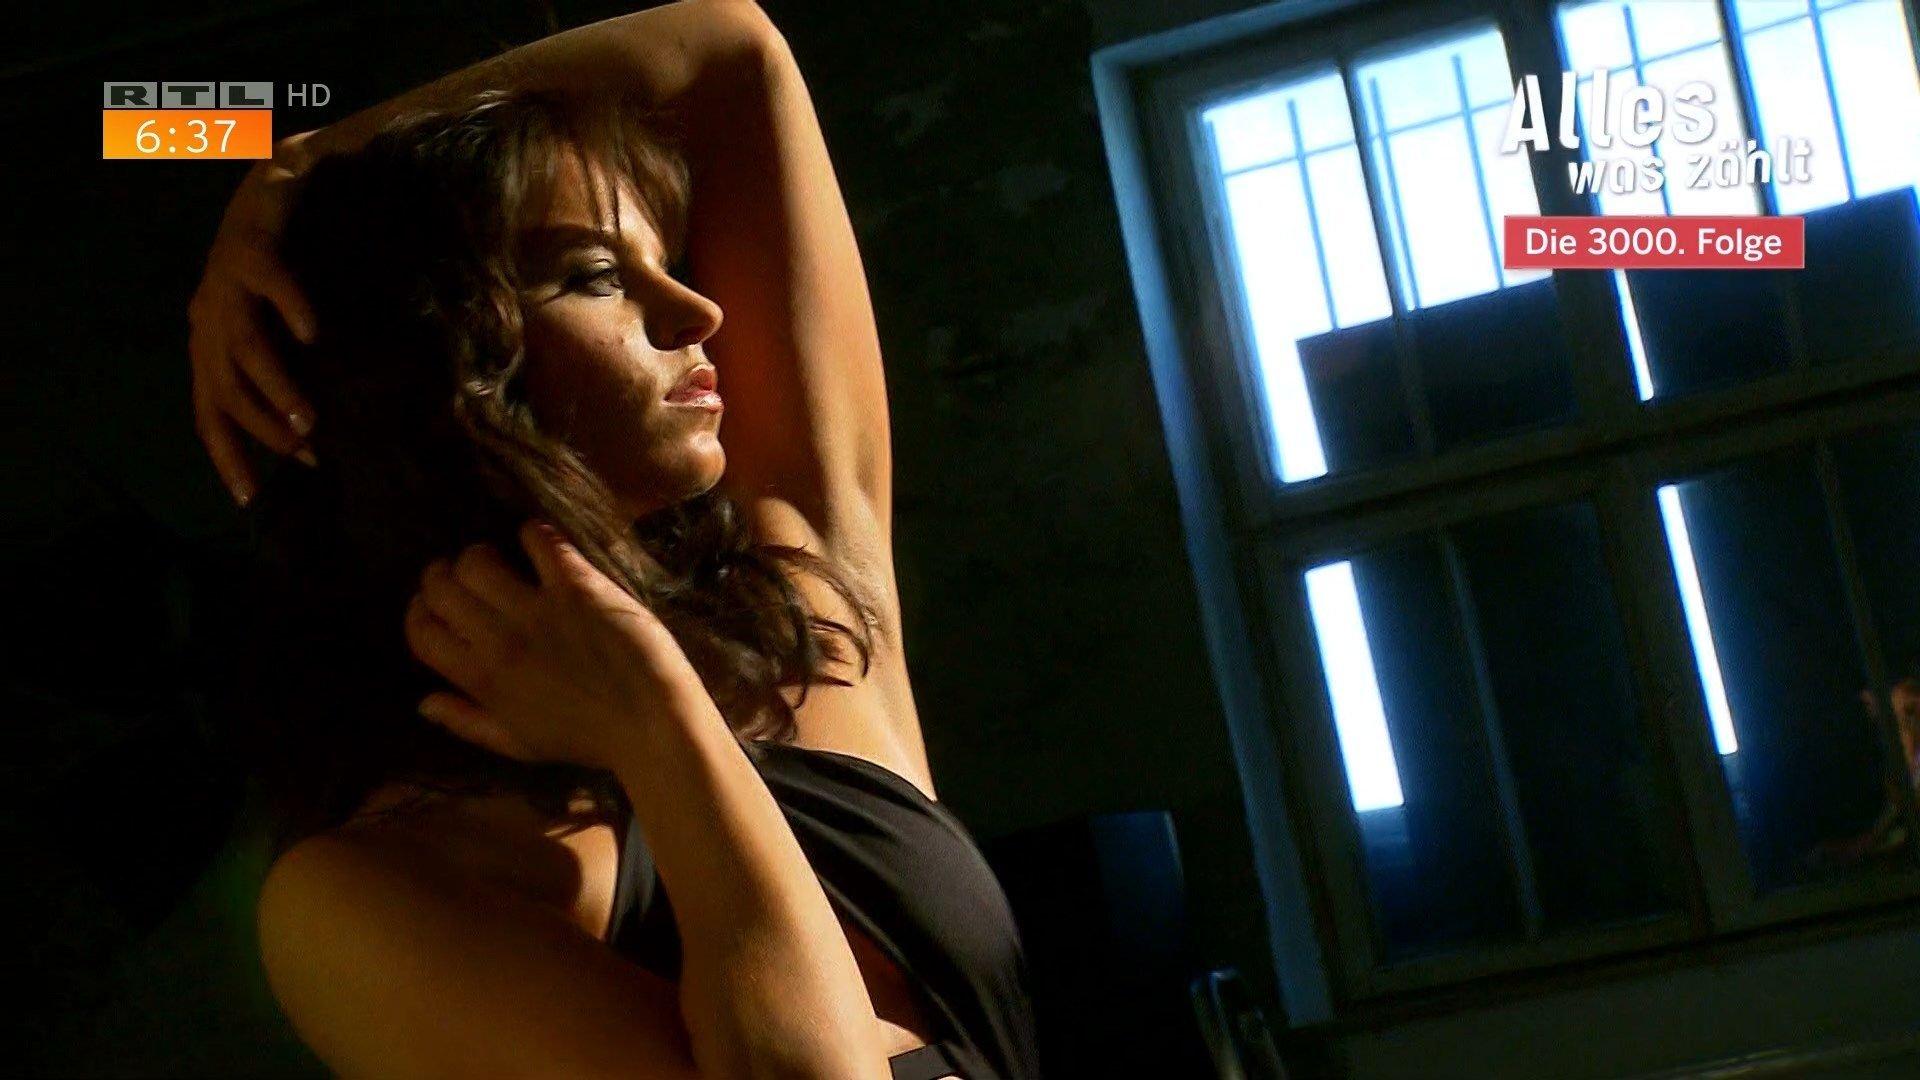 Laura dahlmeier sexy